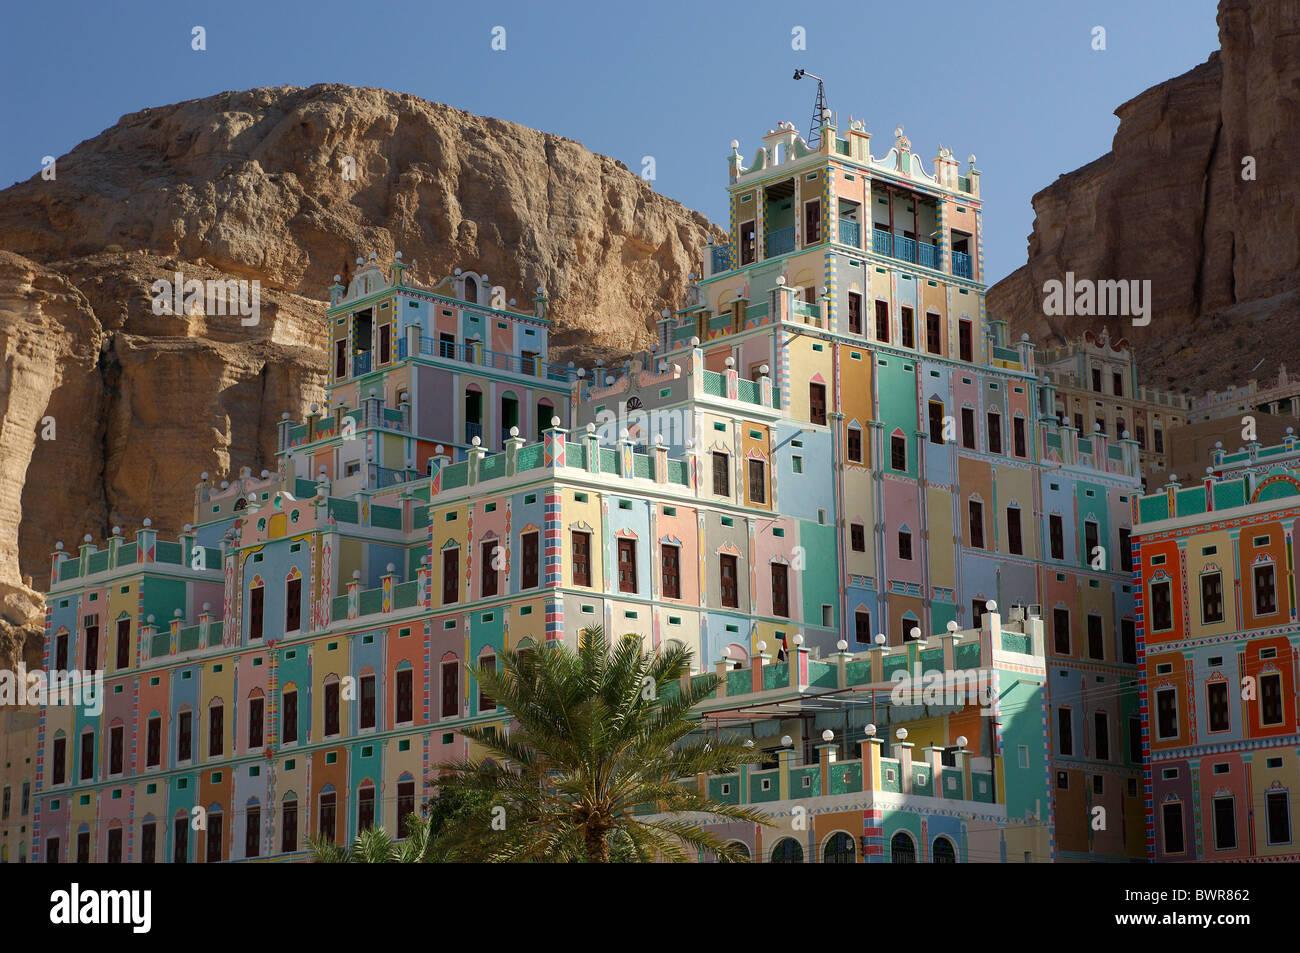 Yemen Khailah Palace Khailah Wadi Hadramaut Hadhramaut Hadramaut South Yemen Arabian Peninsula Middle East Ea Stock Photo